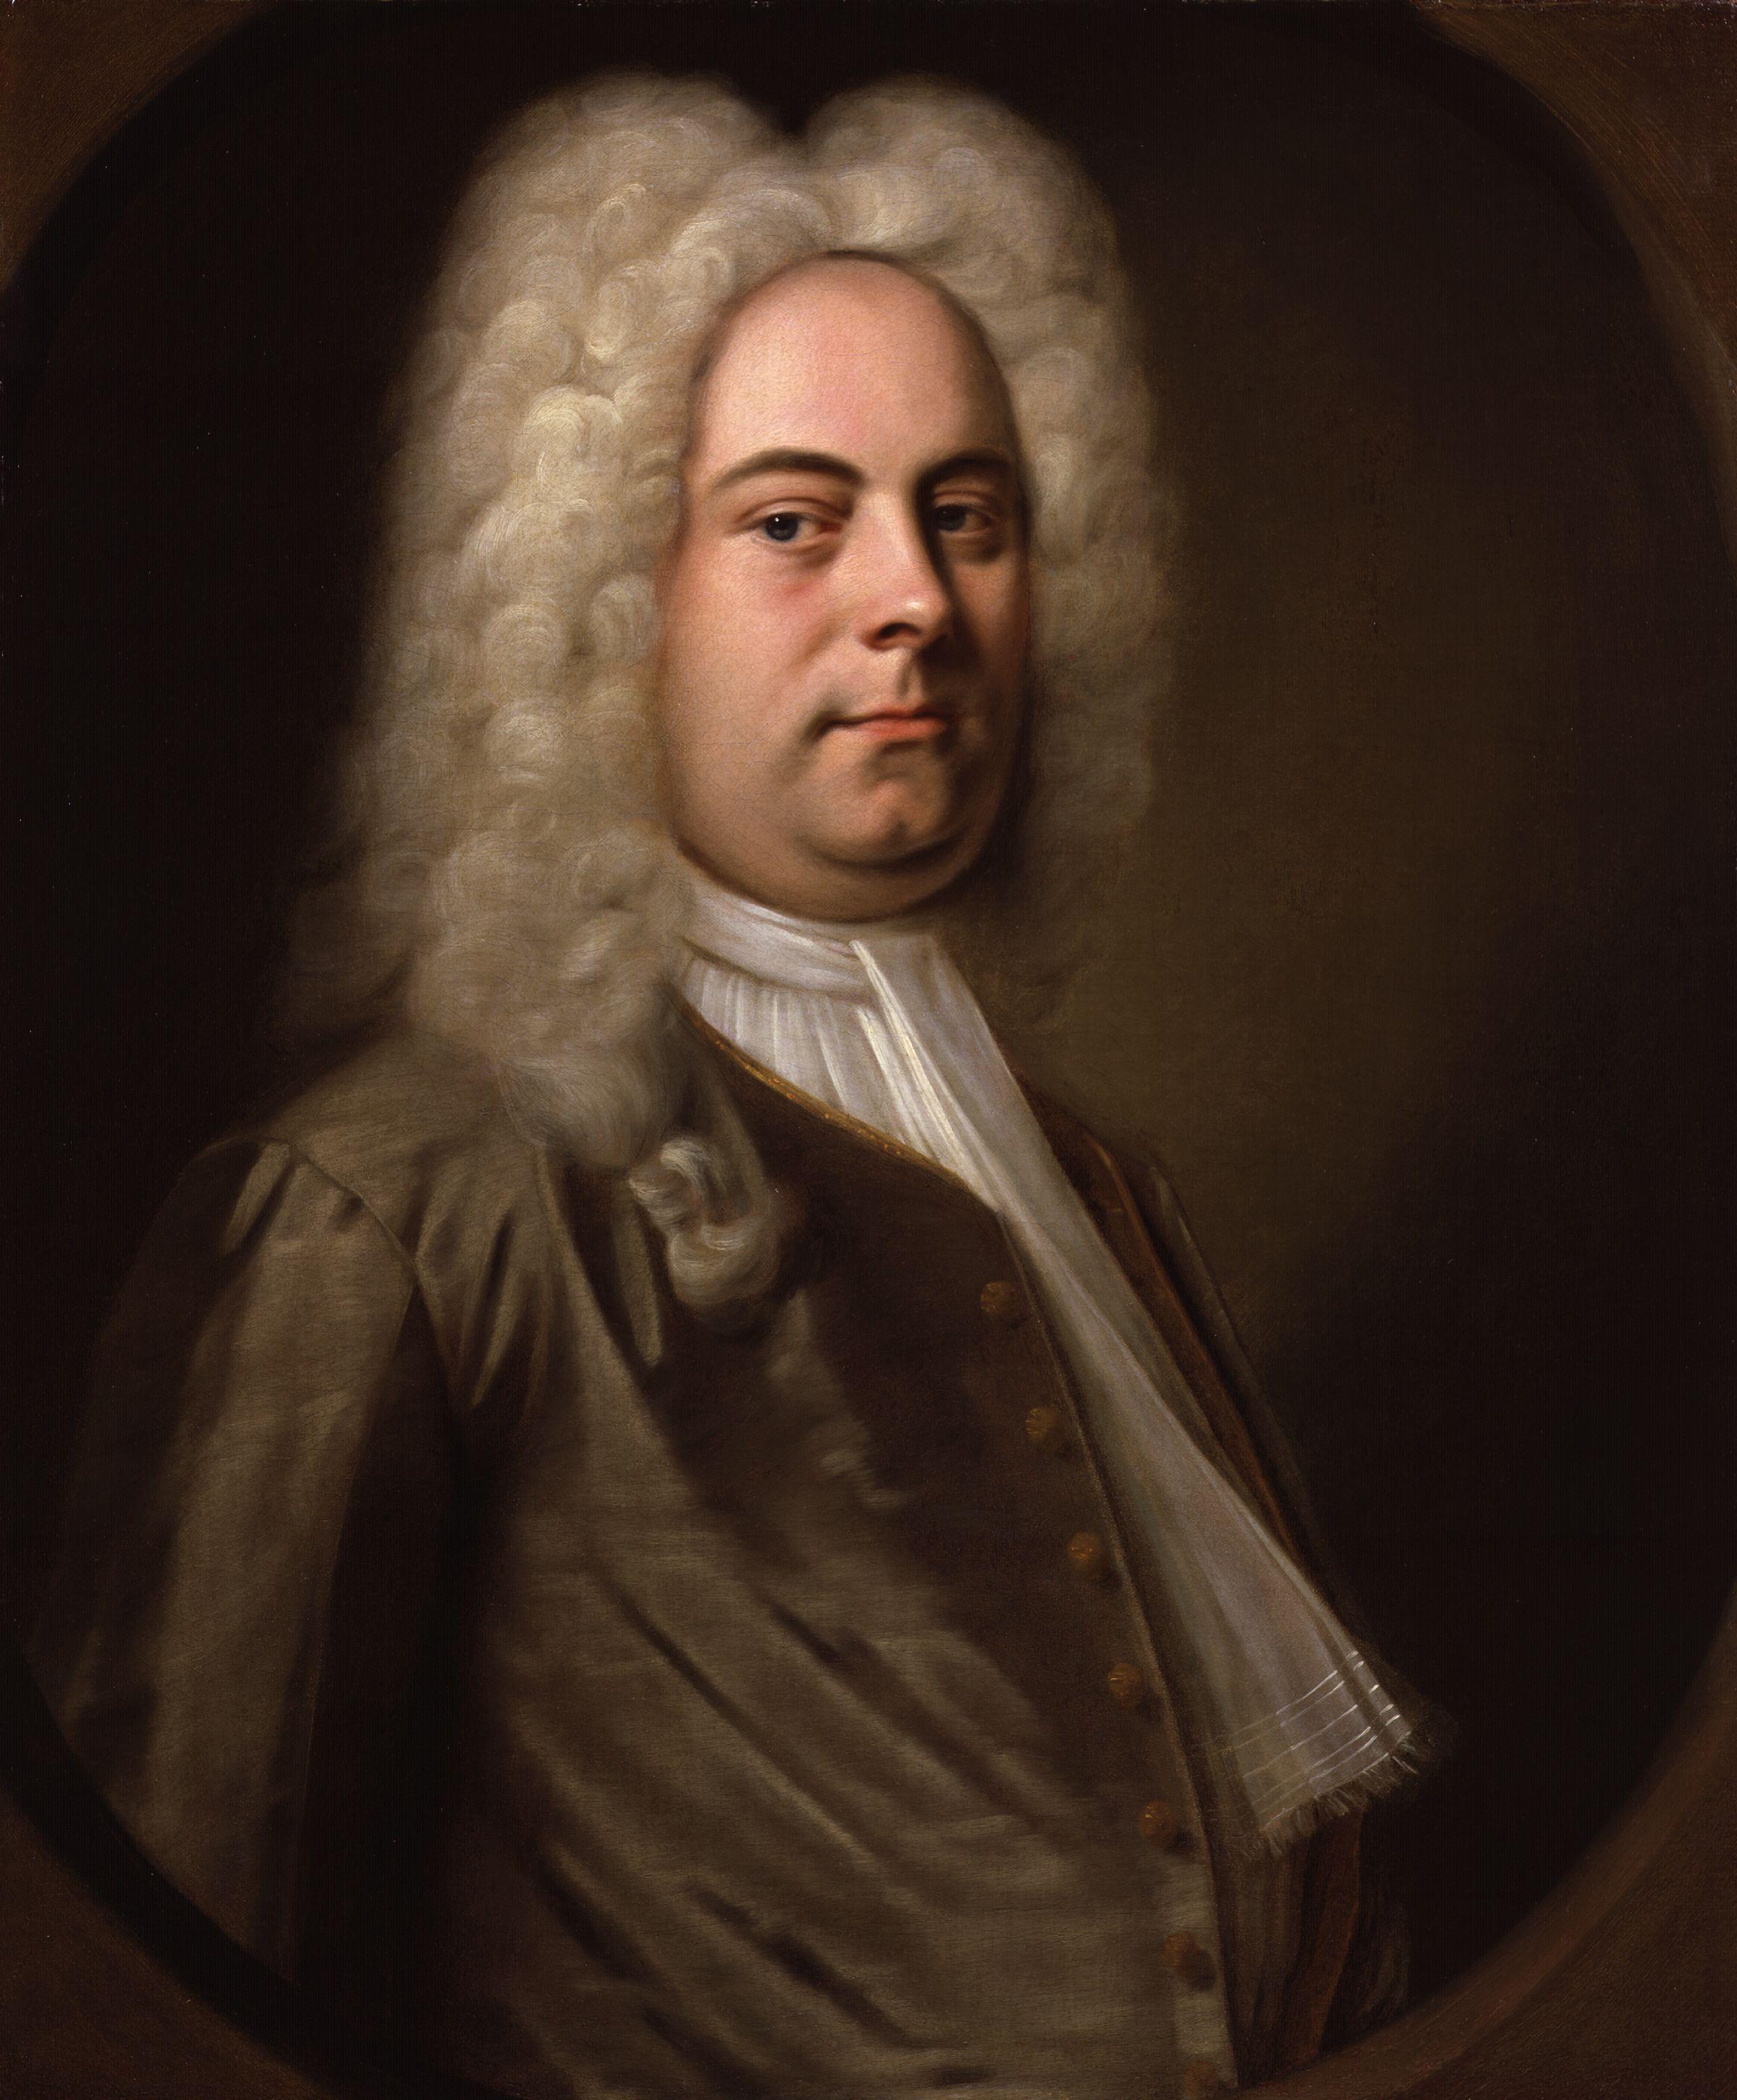 George Frideric Handel, by Balthasar Denner (circa 1726–1728)